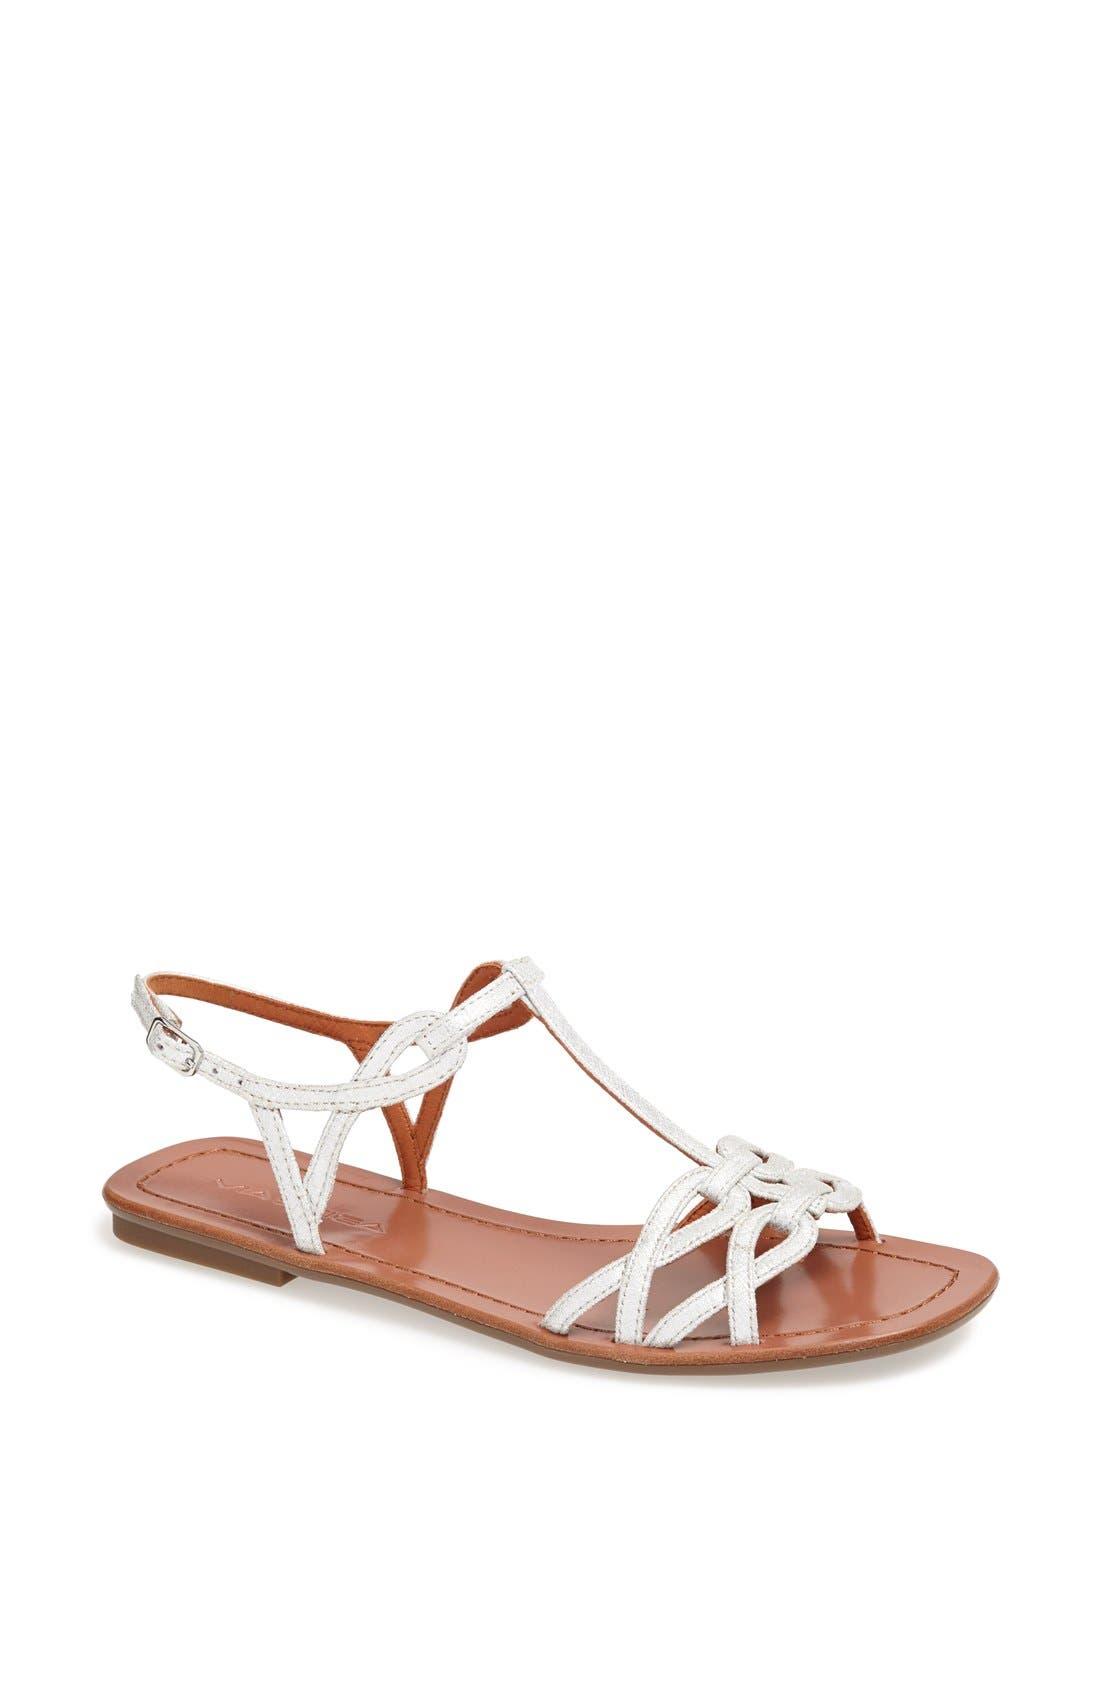 Alternate Image 1 Selected - Via Spiga 'Delila' Sandal